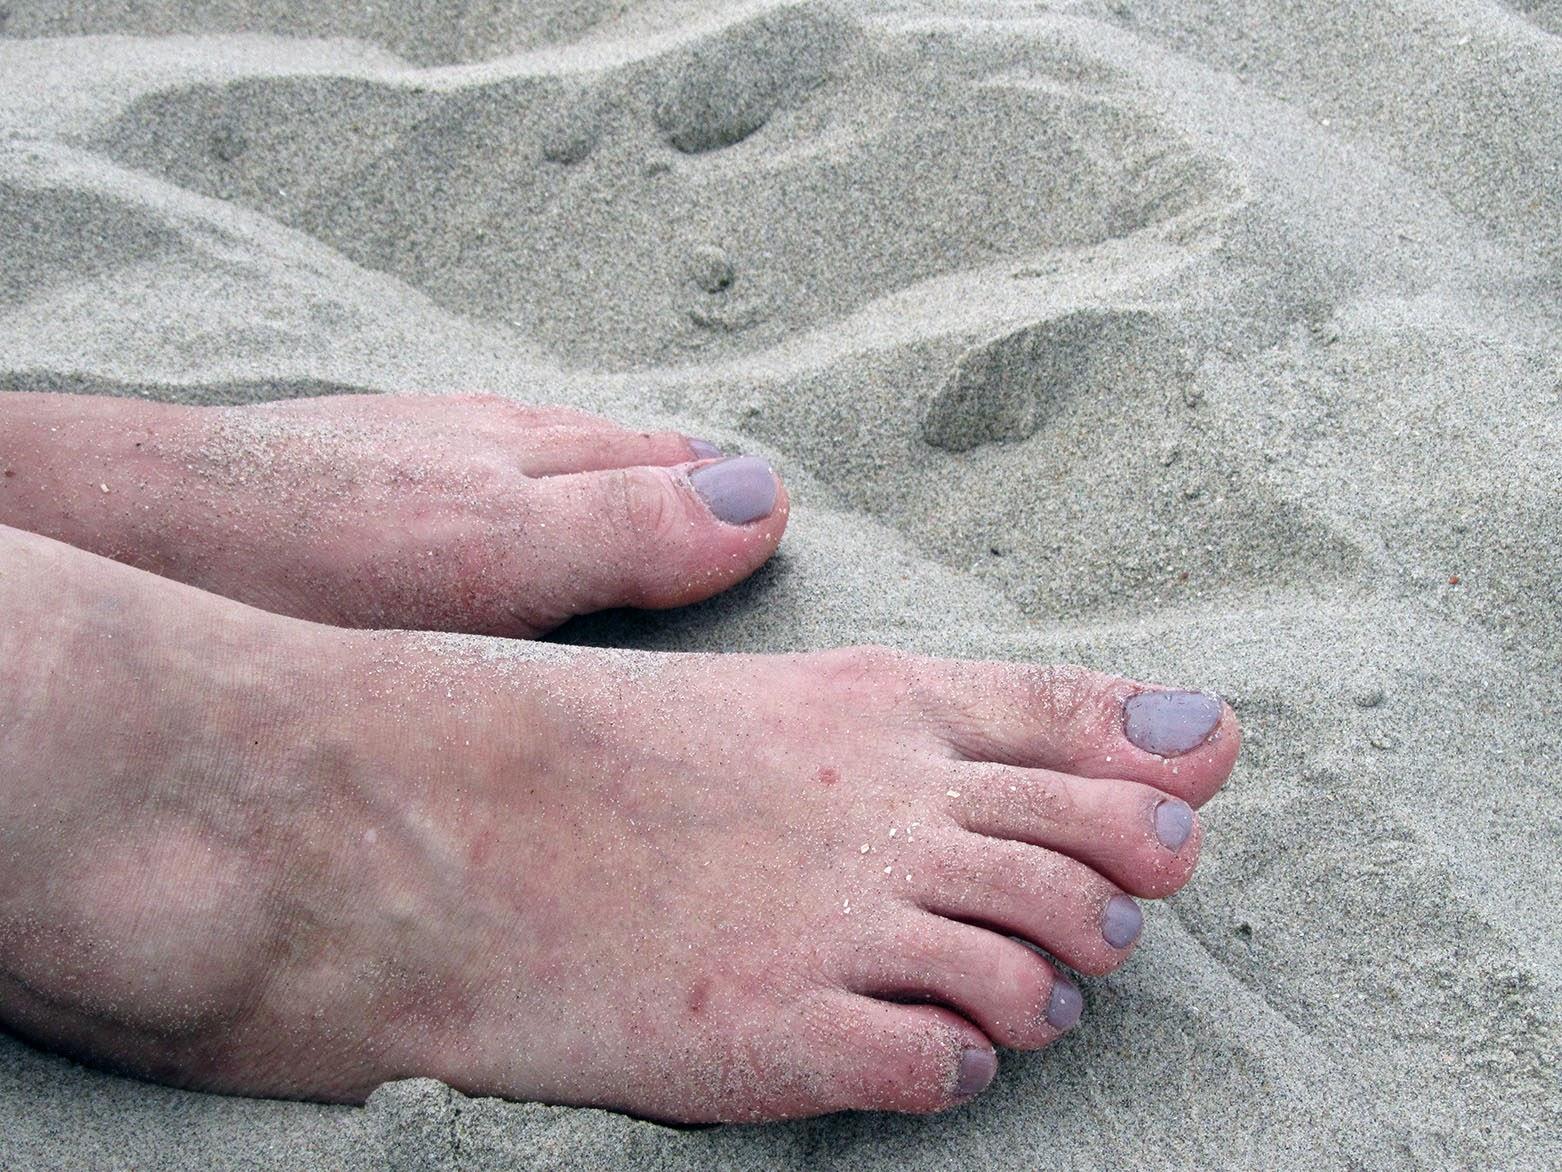 my sister's feet